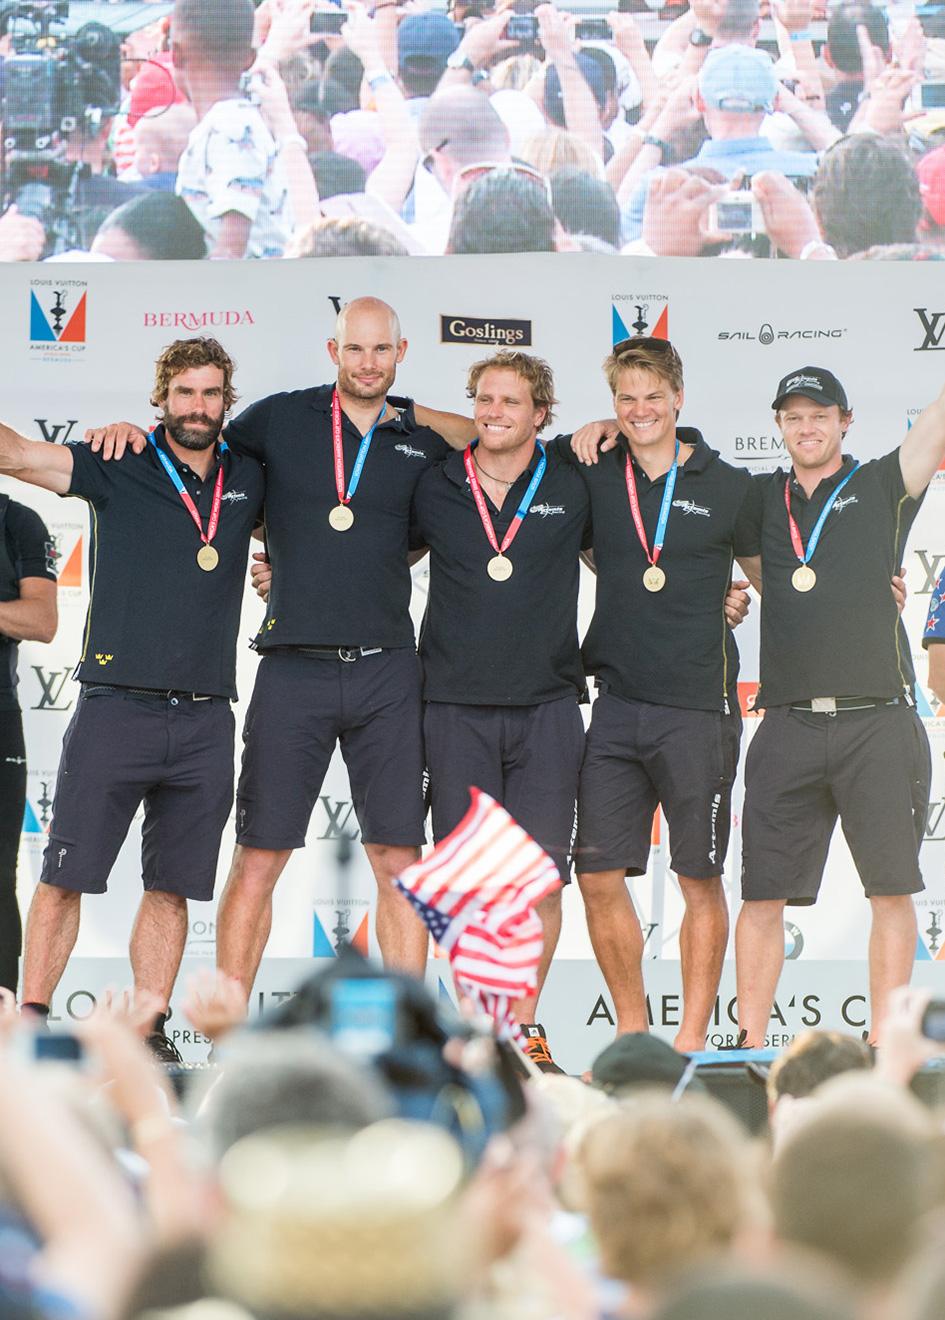 Portrait Americas Cup World Series Bermuda Portrait Artemis Racing Wins